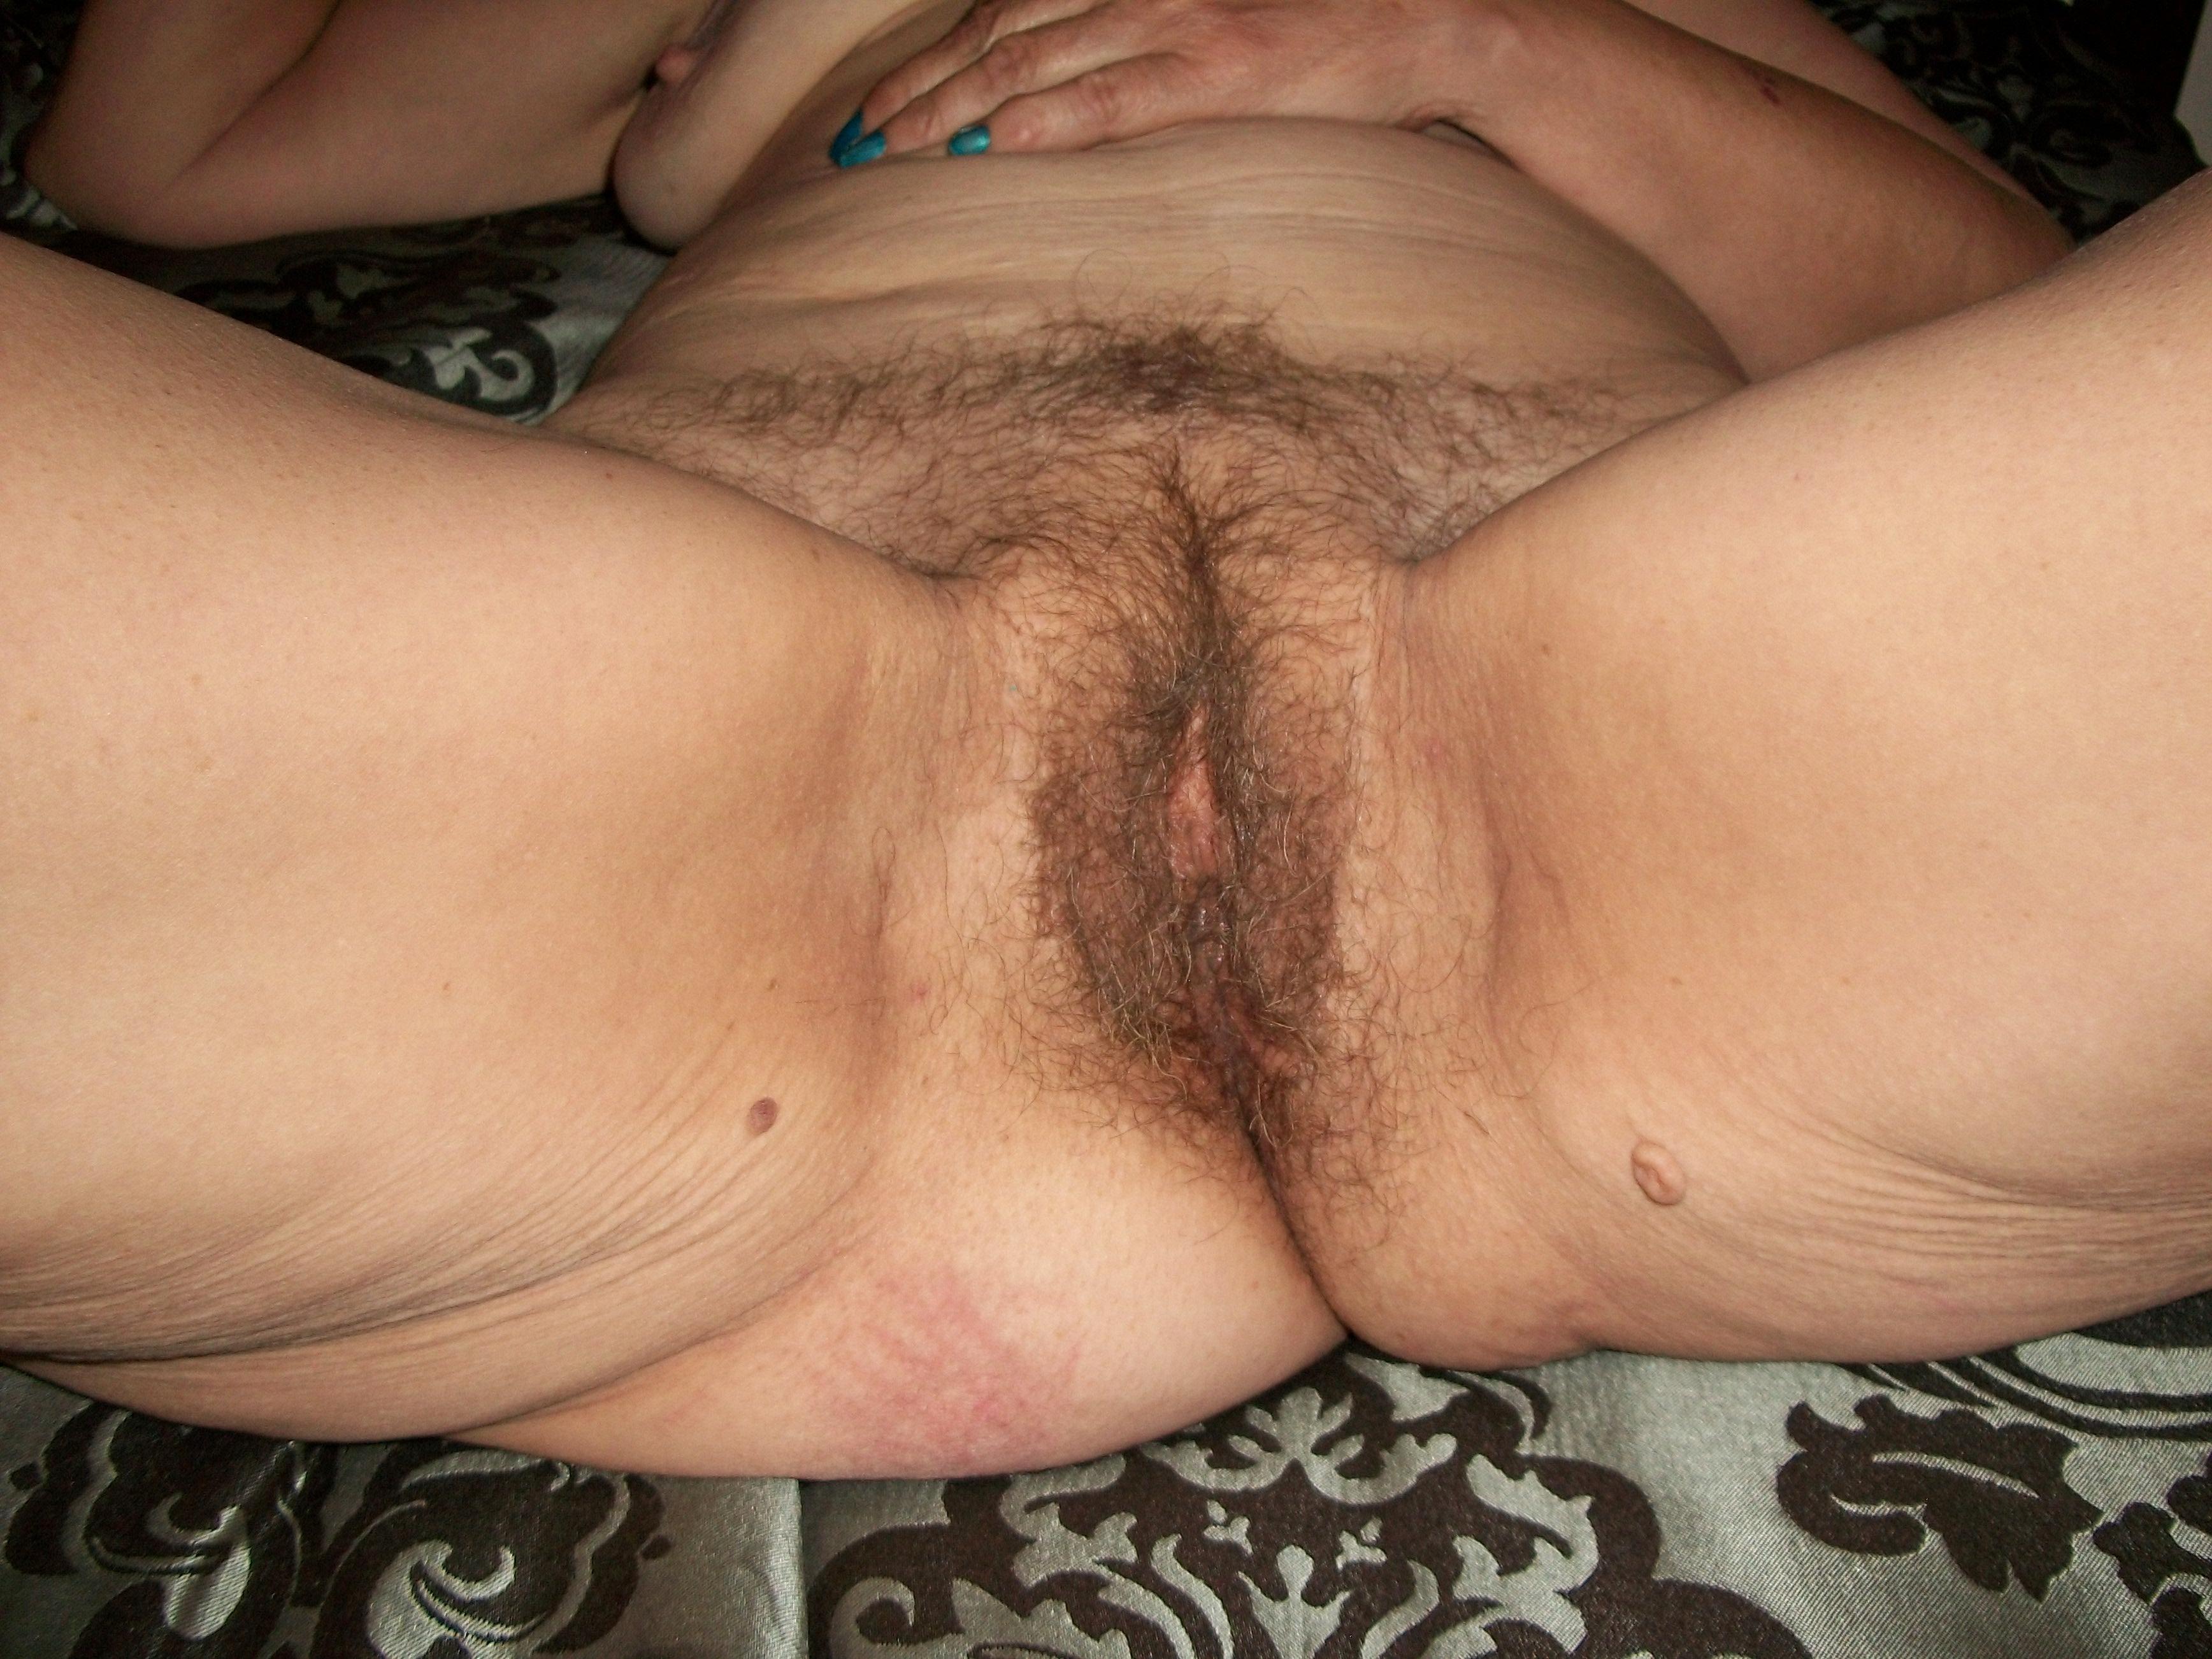 File:01 - Unshaved Vulva.jpg - Wikimedia Commons